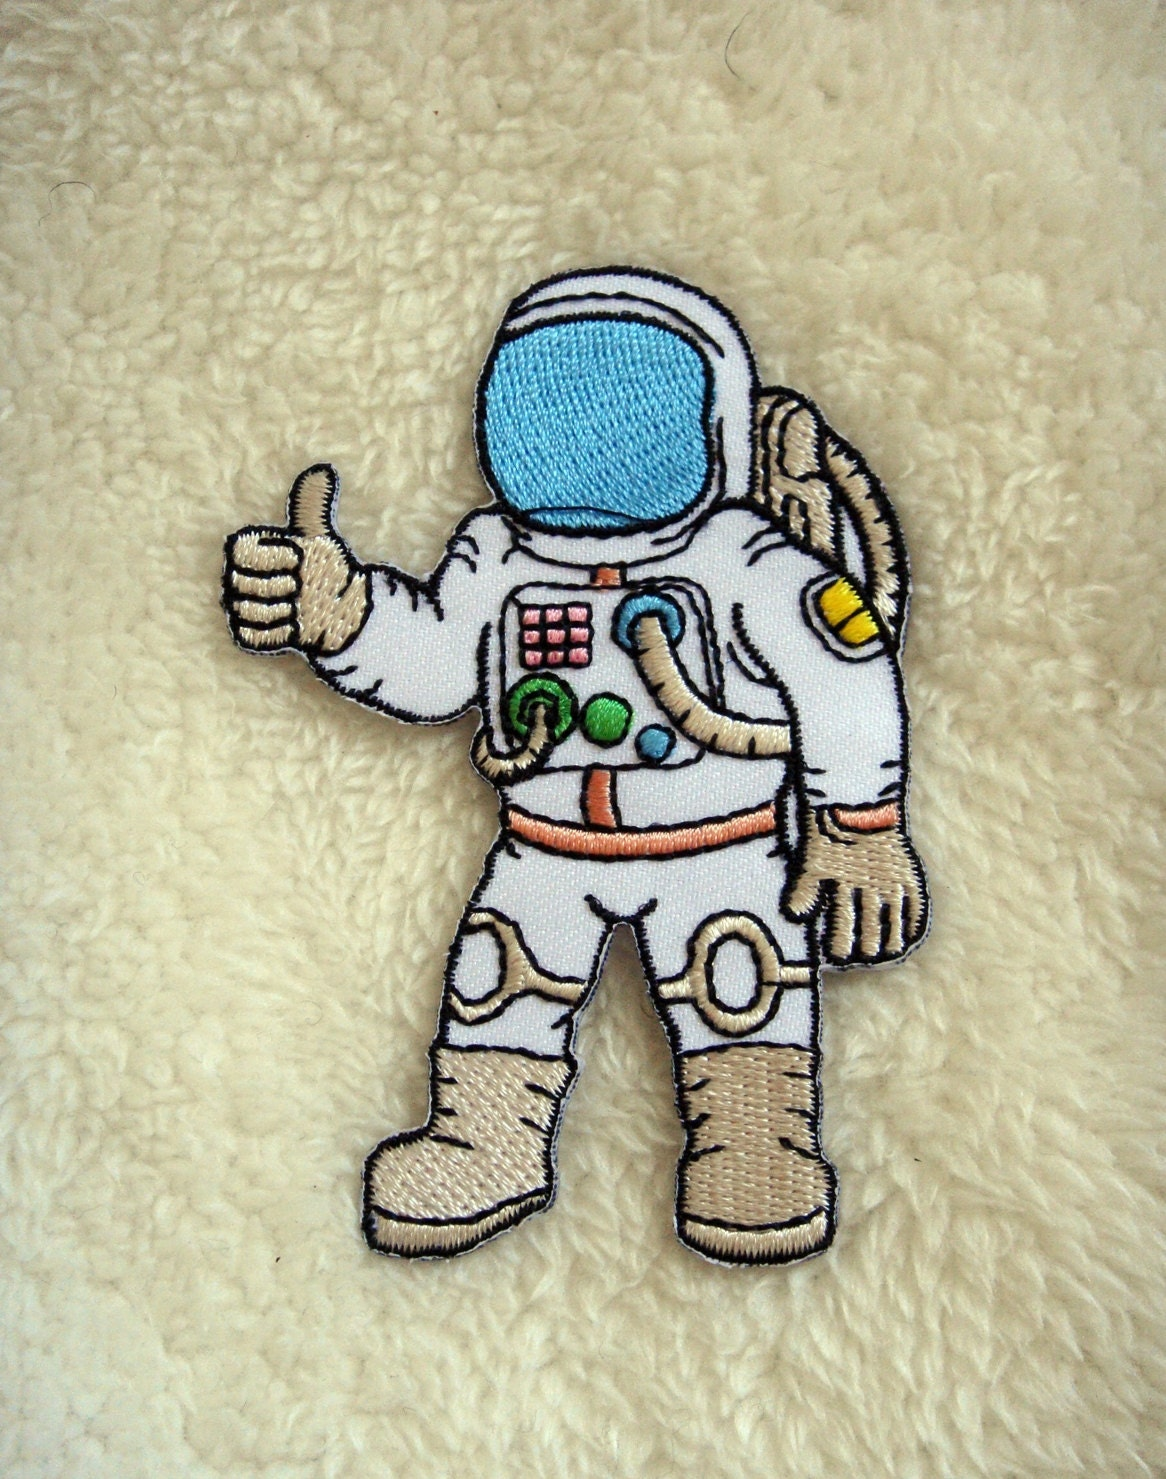 Astronaut Applique Iron On Patch - Astronaut decorations